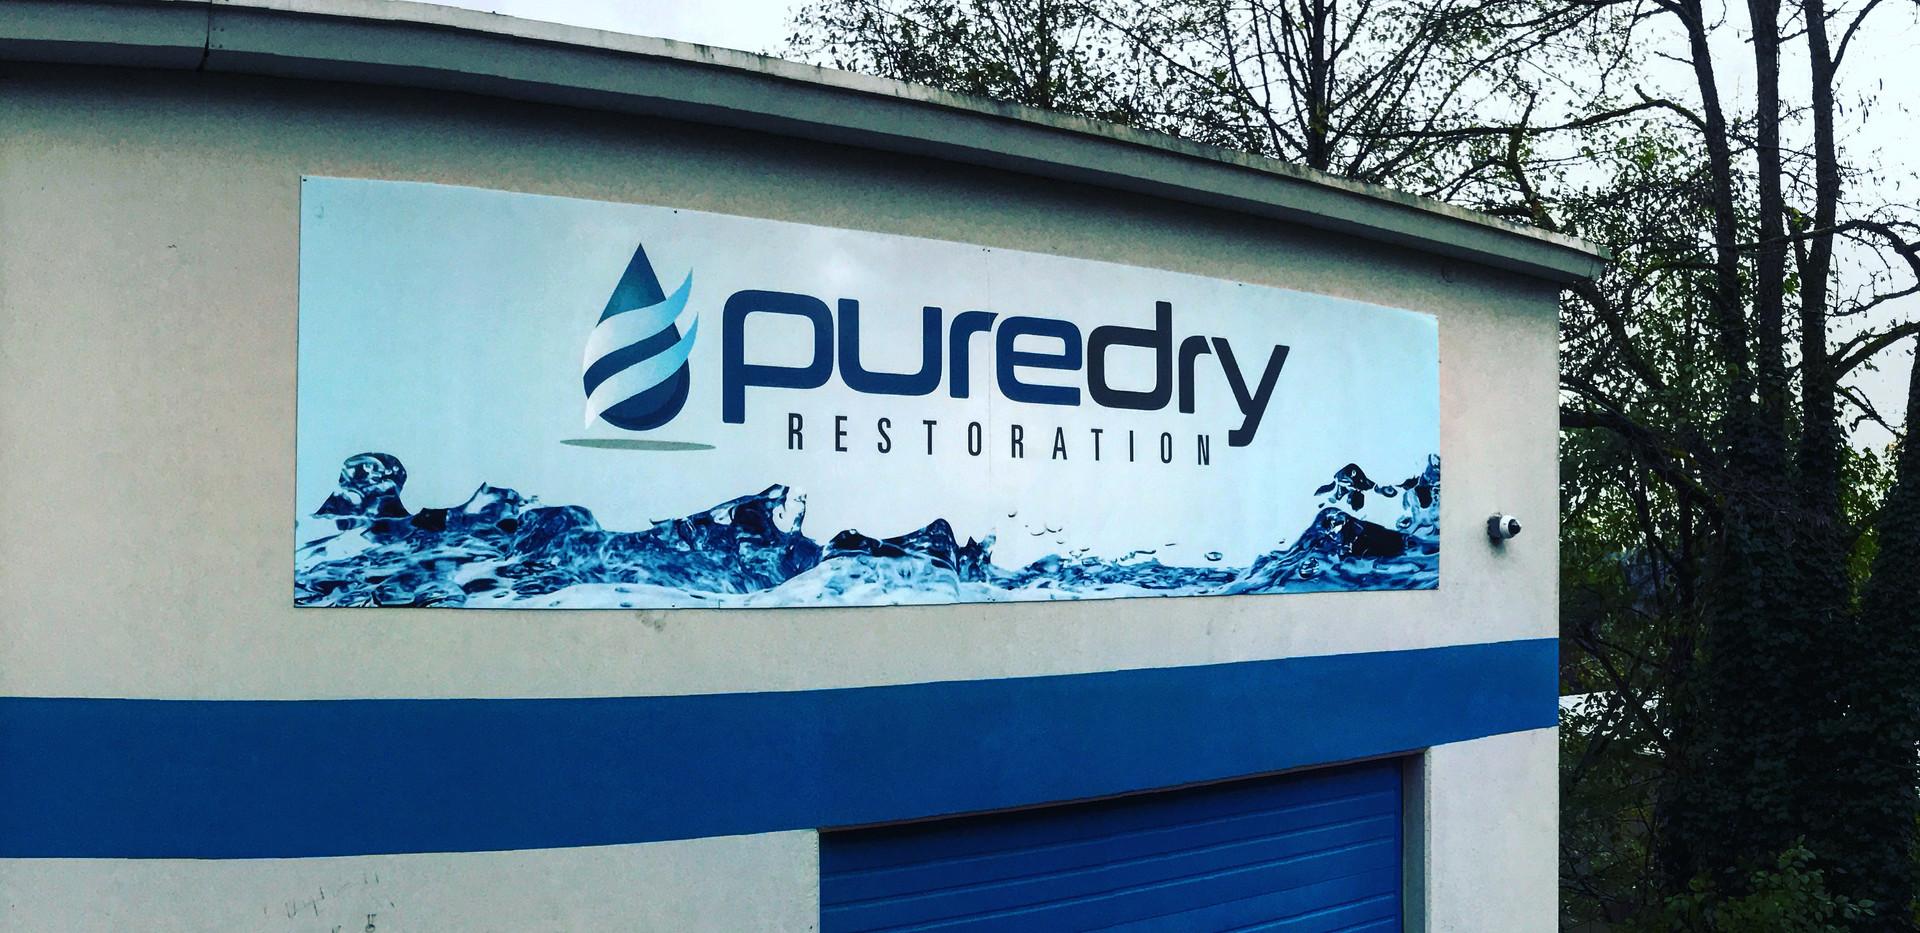 Puredry Building Signage